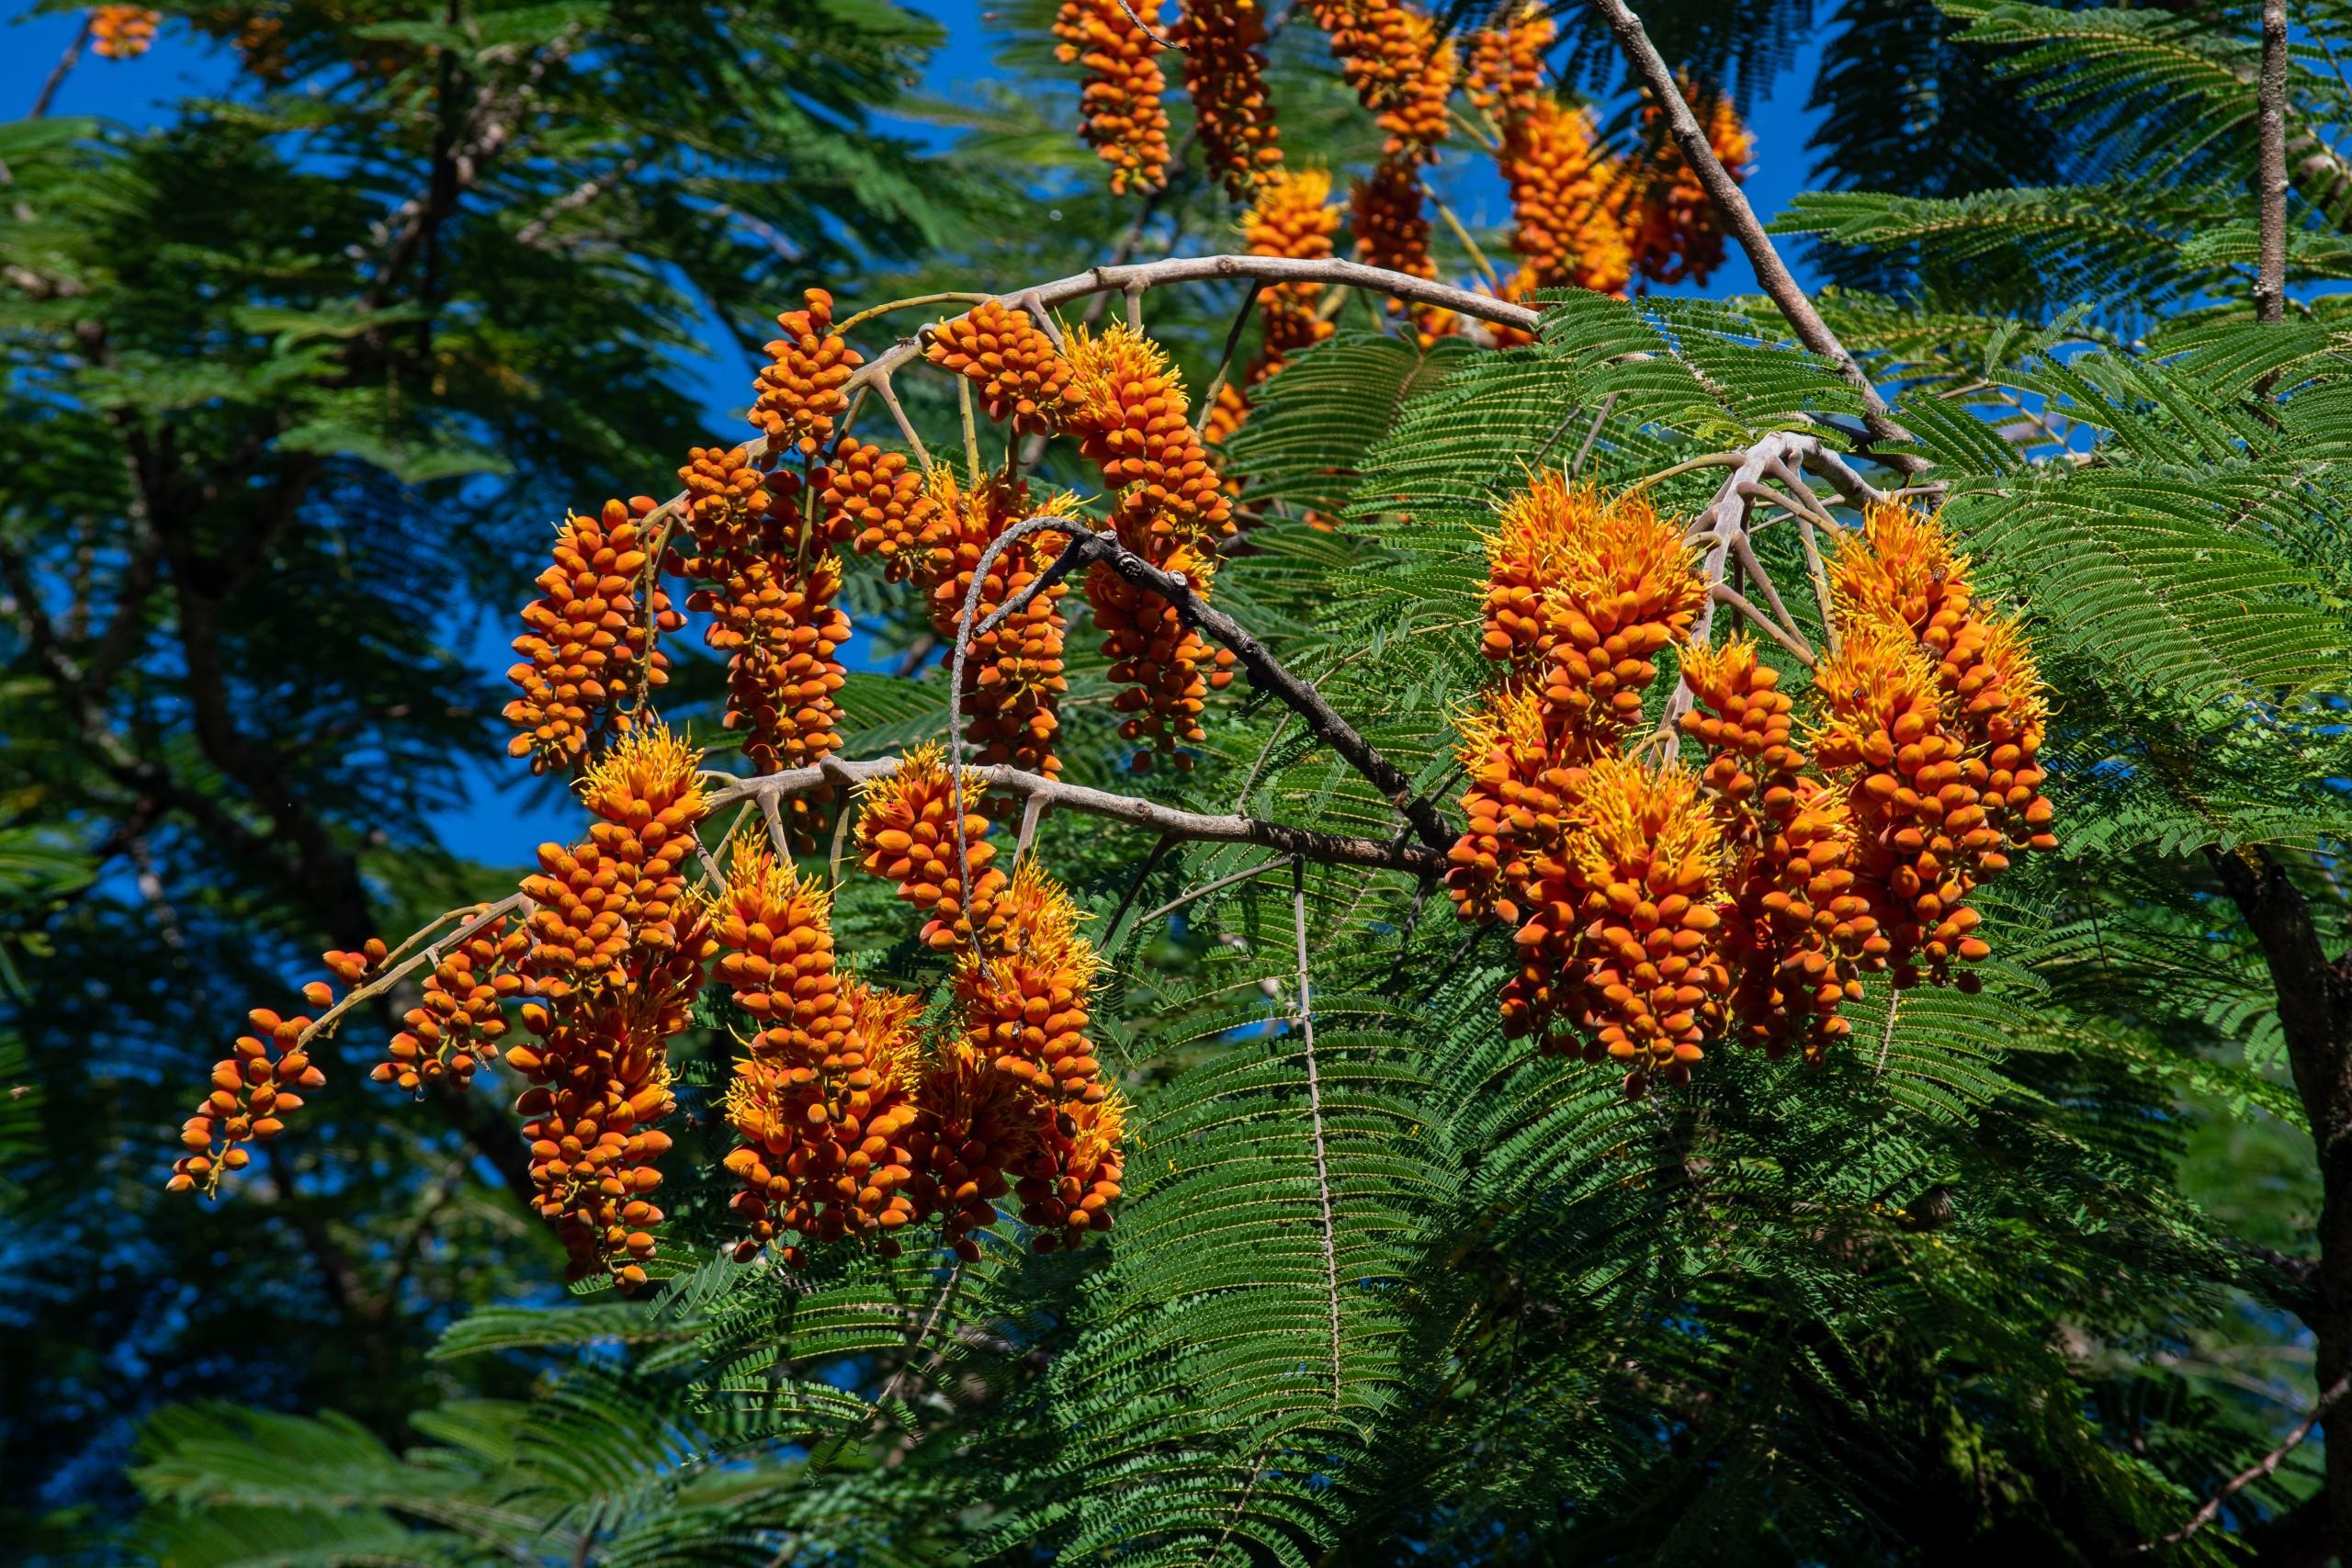 Colvillea Racemosa Things To Do June 25 Waimea Valley 8